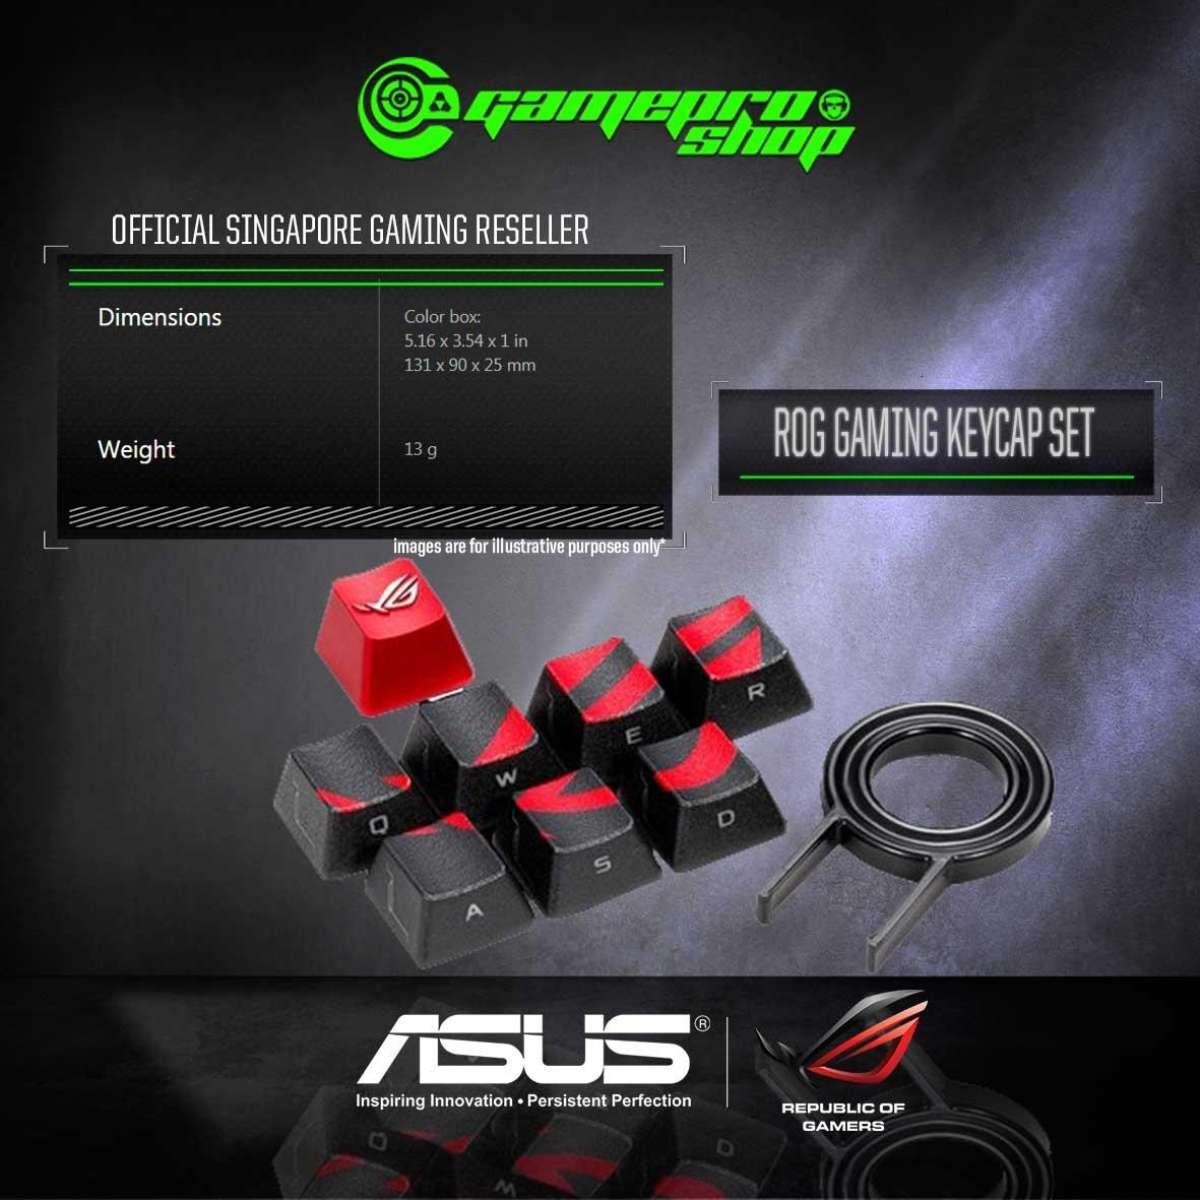 ASUS ROG Gaming Keycap Set - 90MP0100-B0UA00 (1Y ...